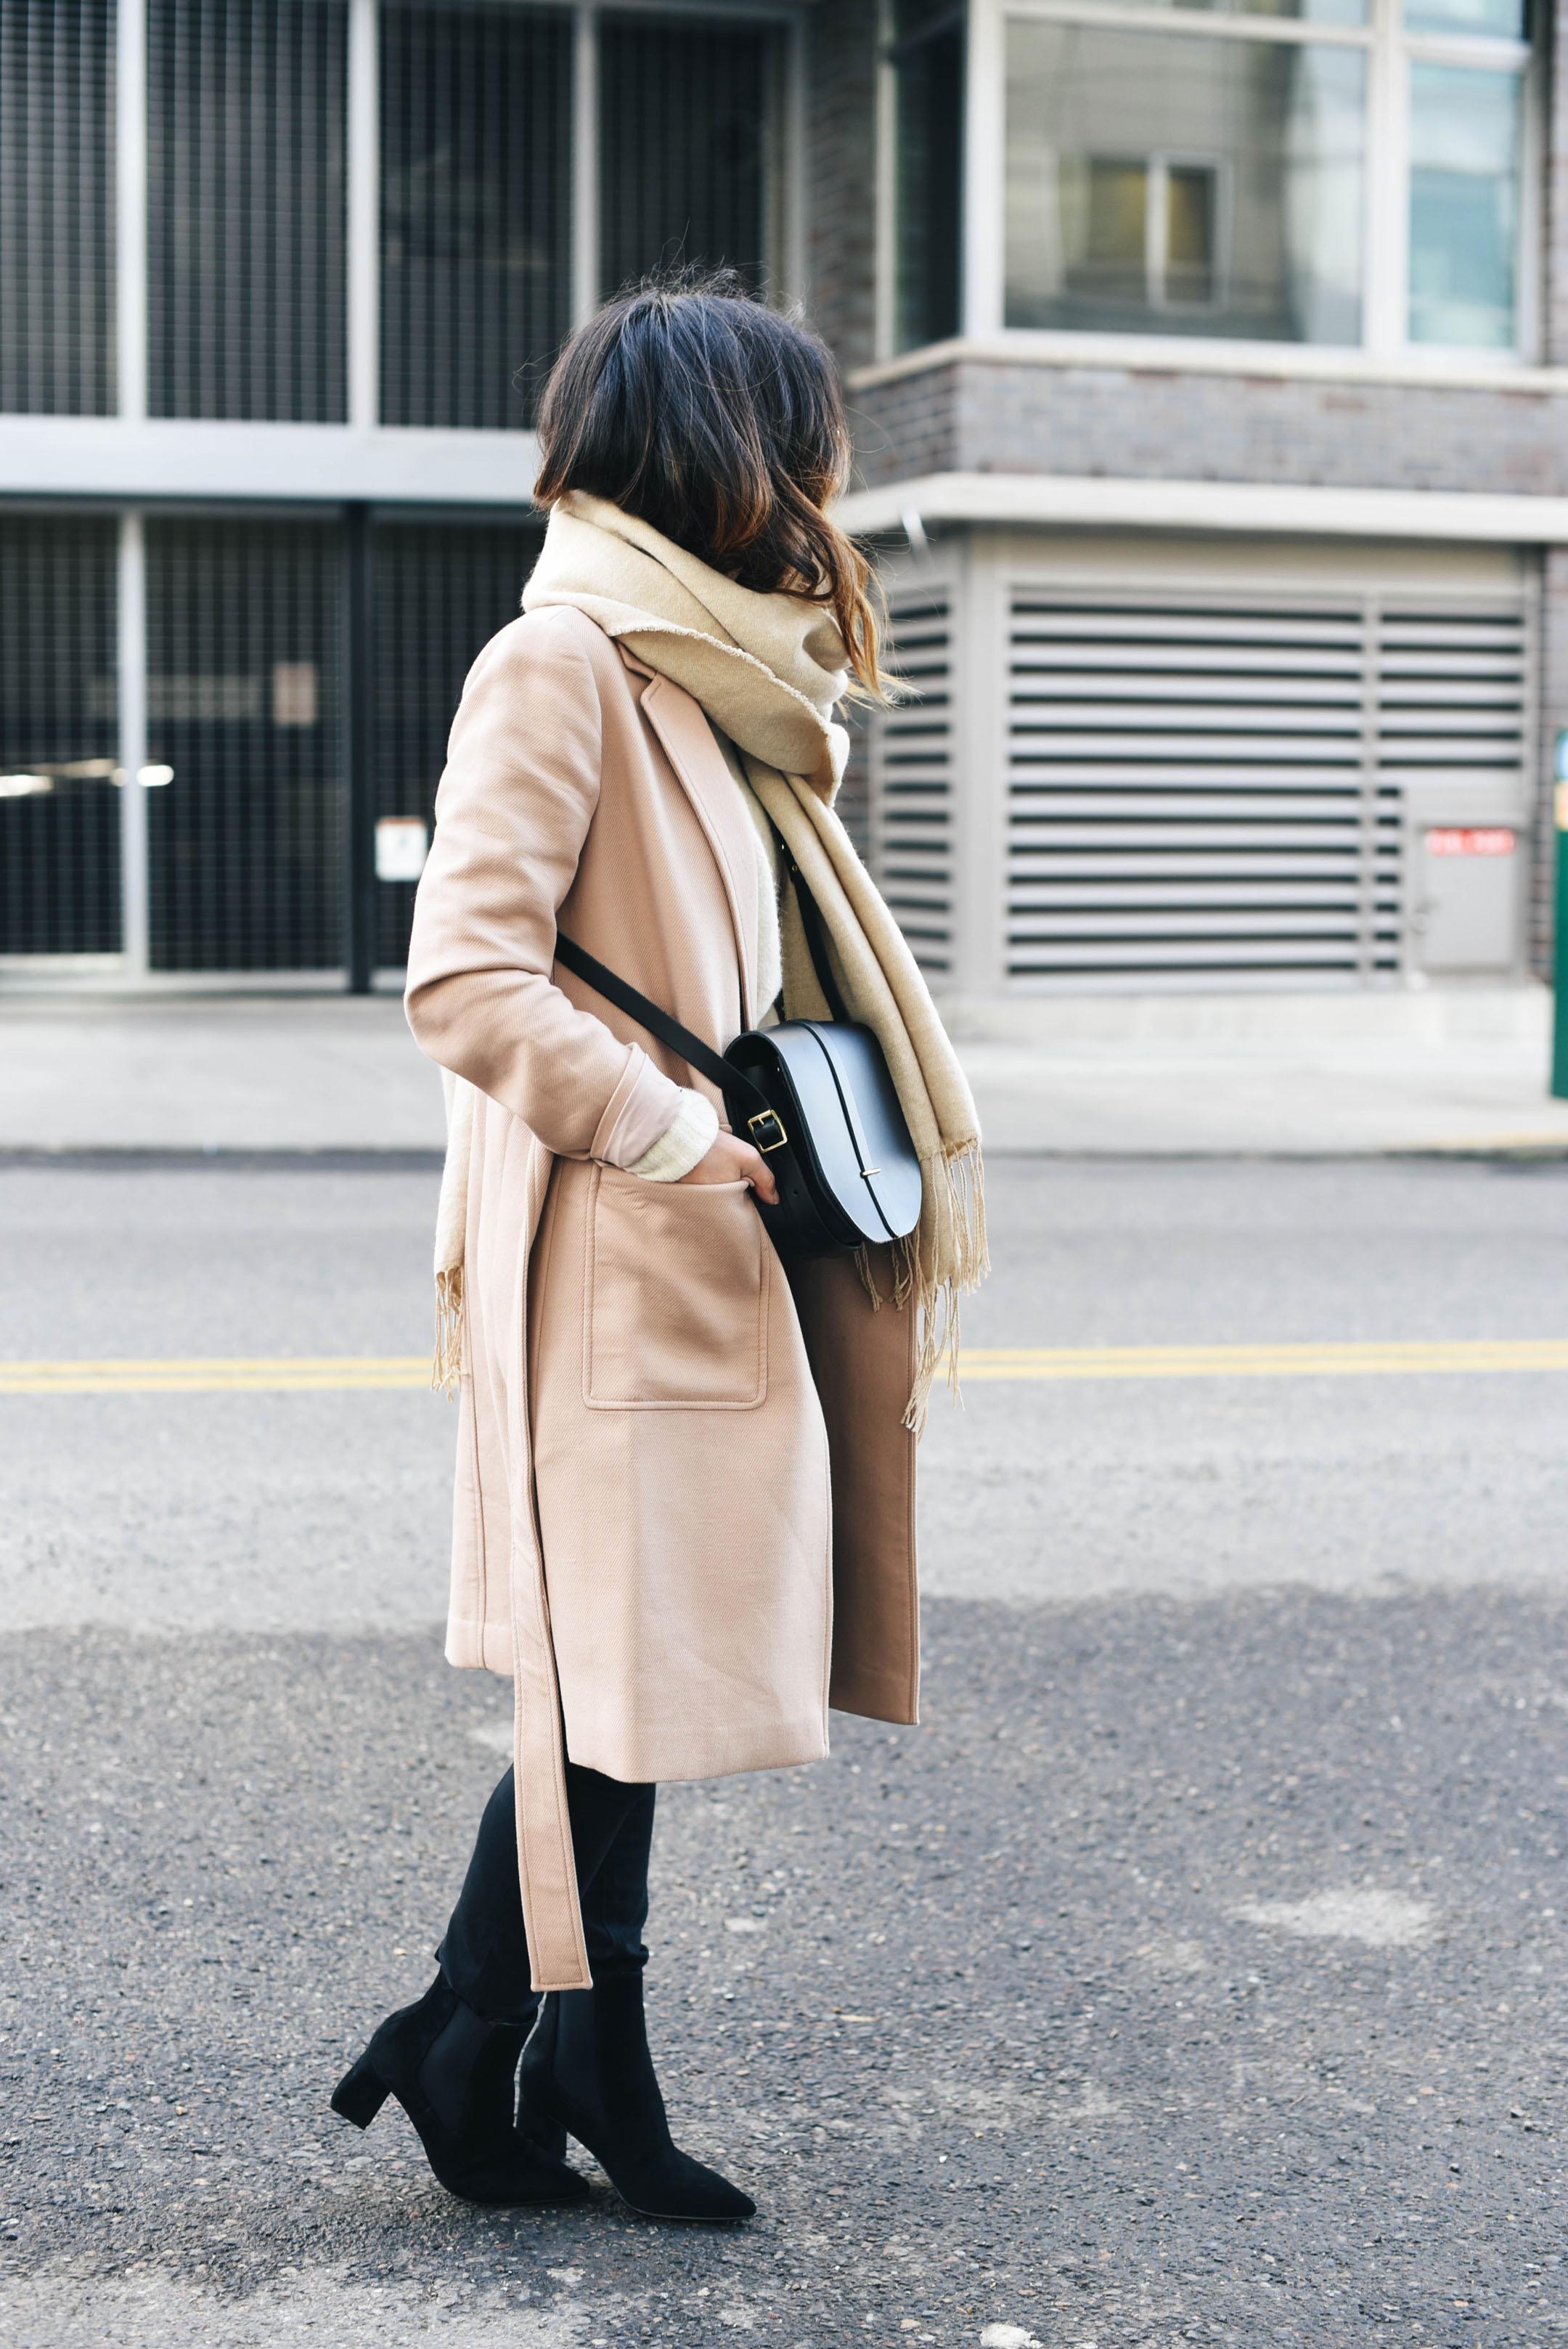 cambridge-satchel-crossbody-leather-bag